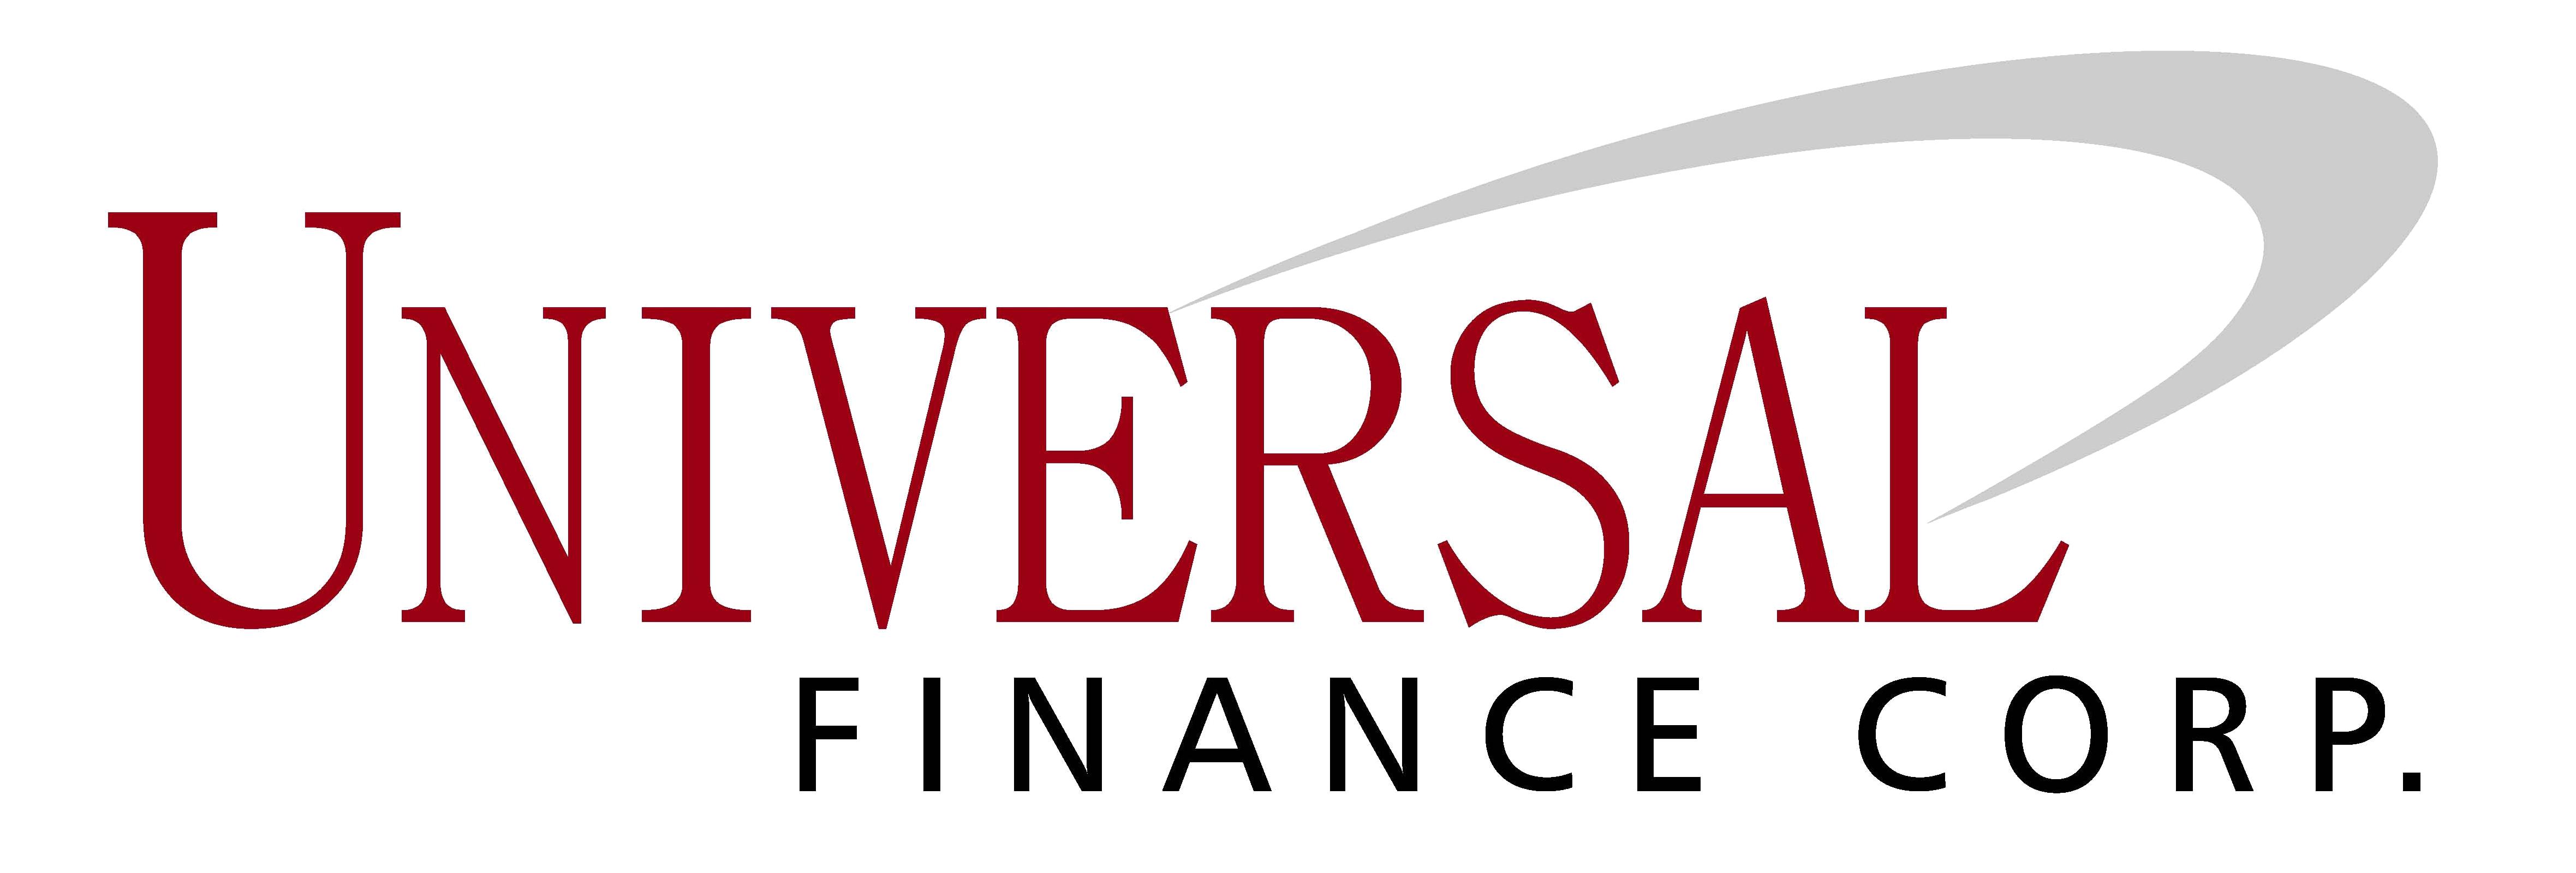 Universal Finance Corp. Commercial Lender